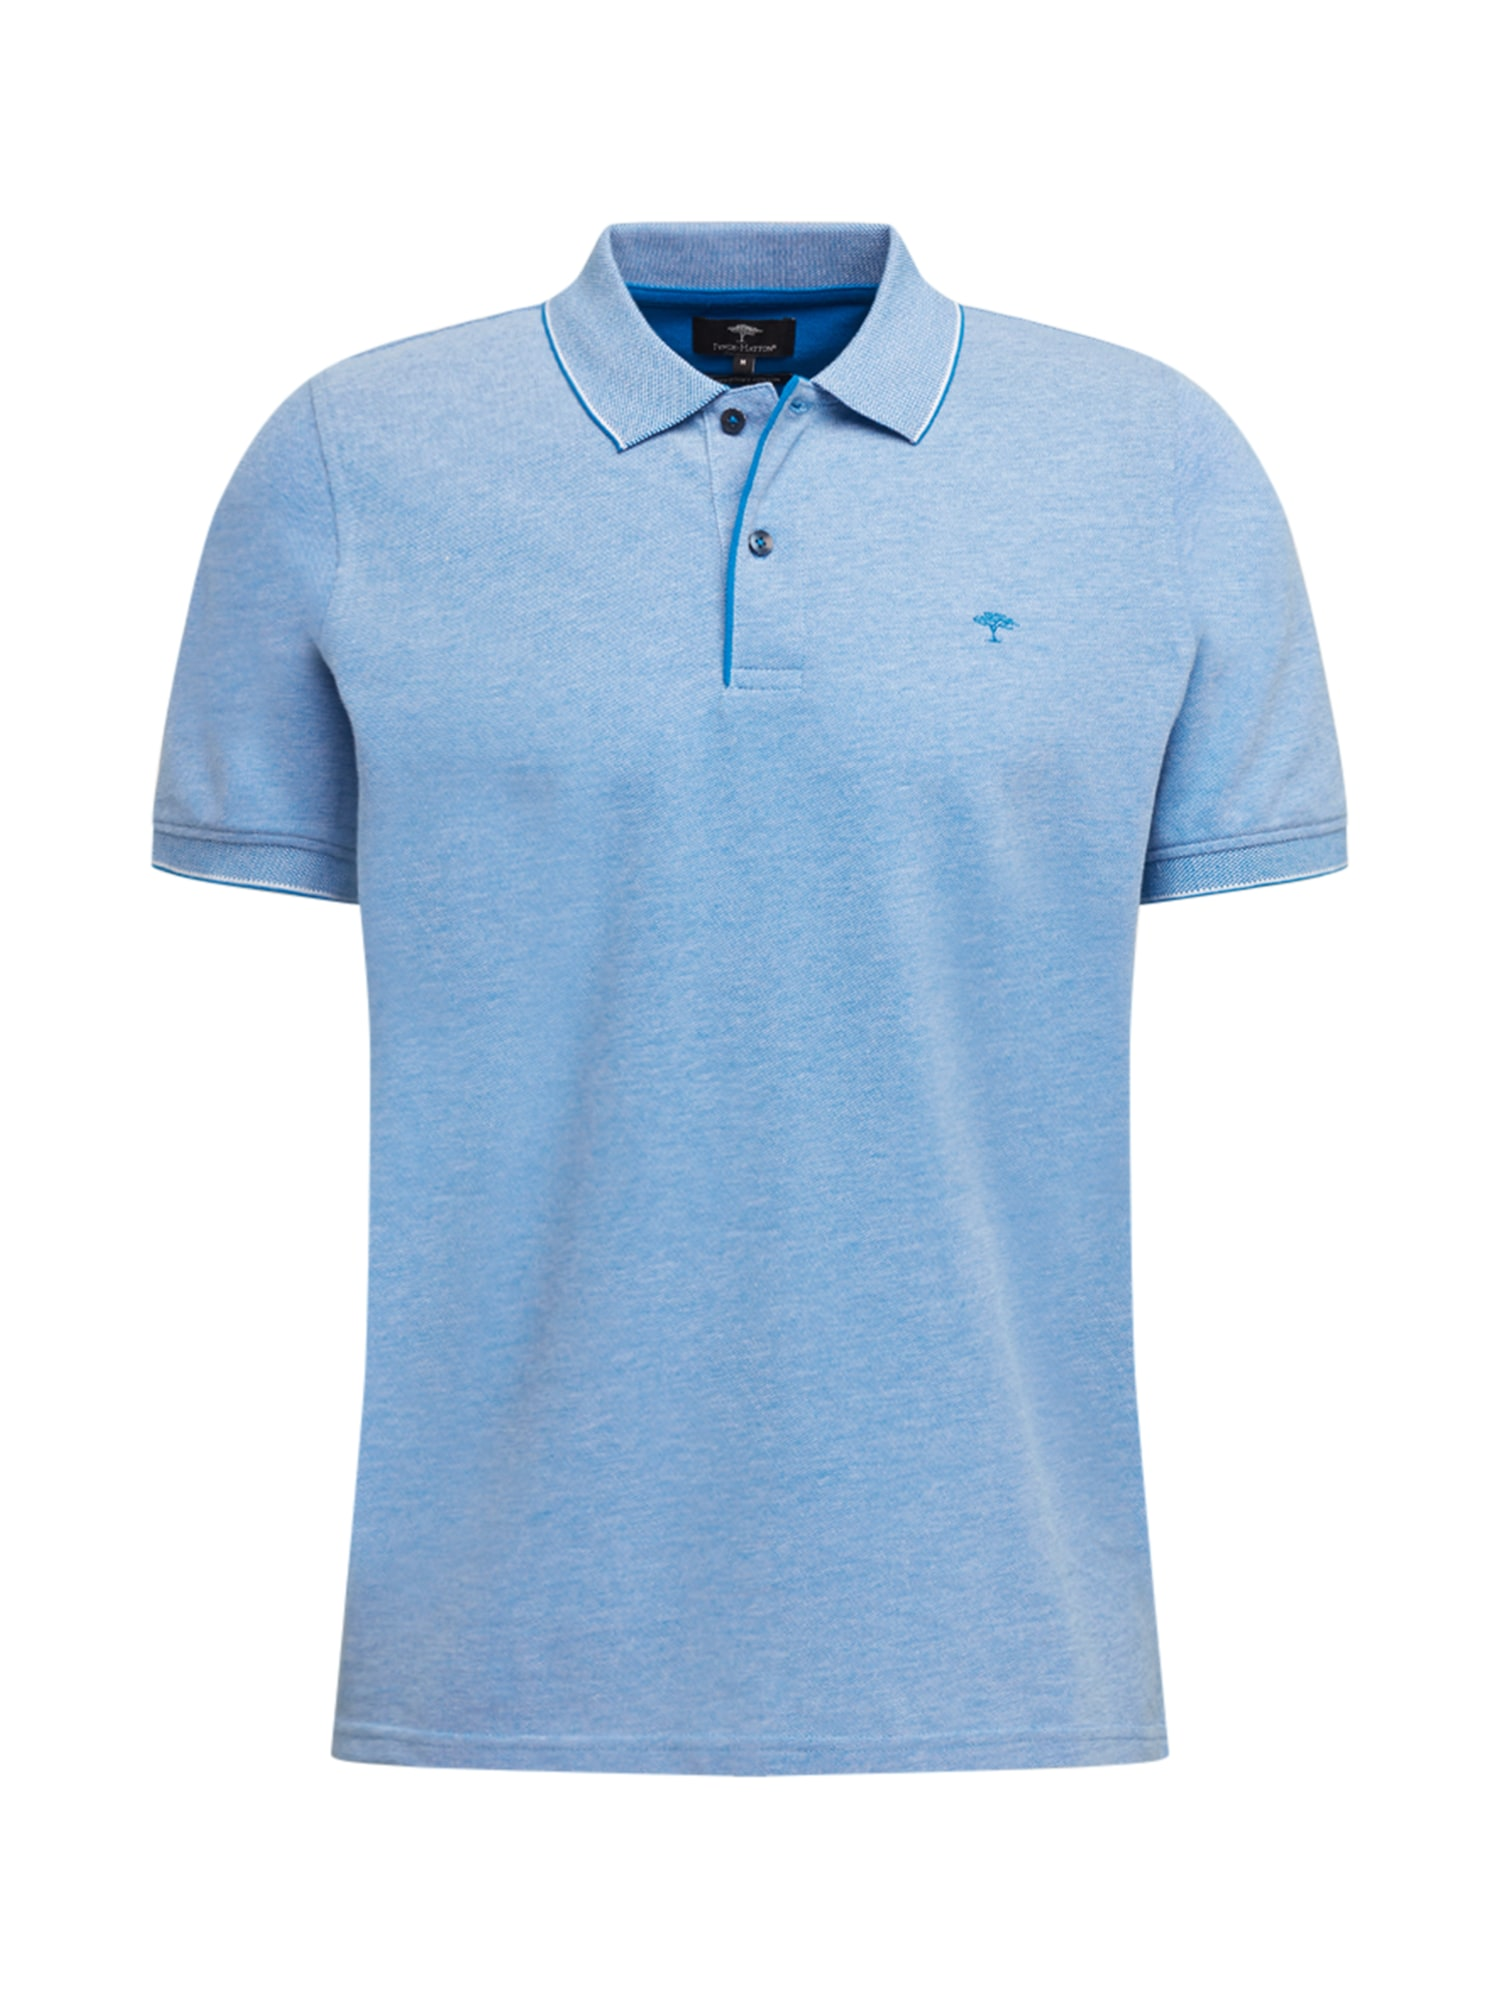 FYNCH-HATTON Marškinėliai margai mėlyna / dangaus žydra